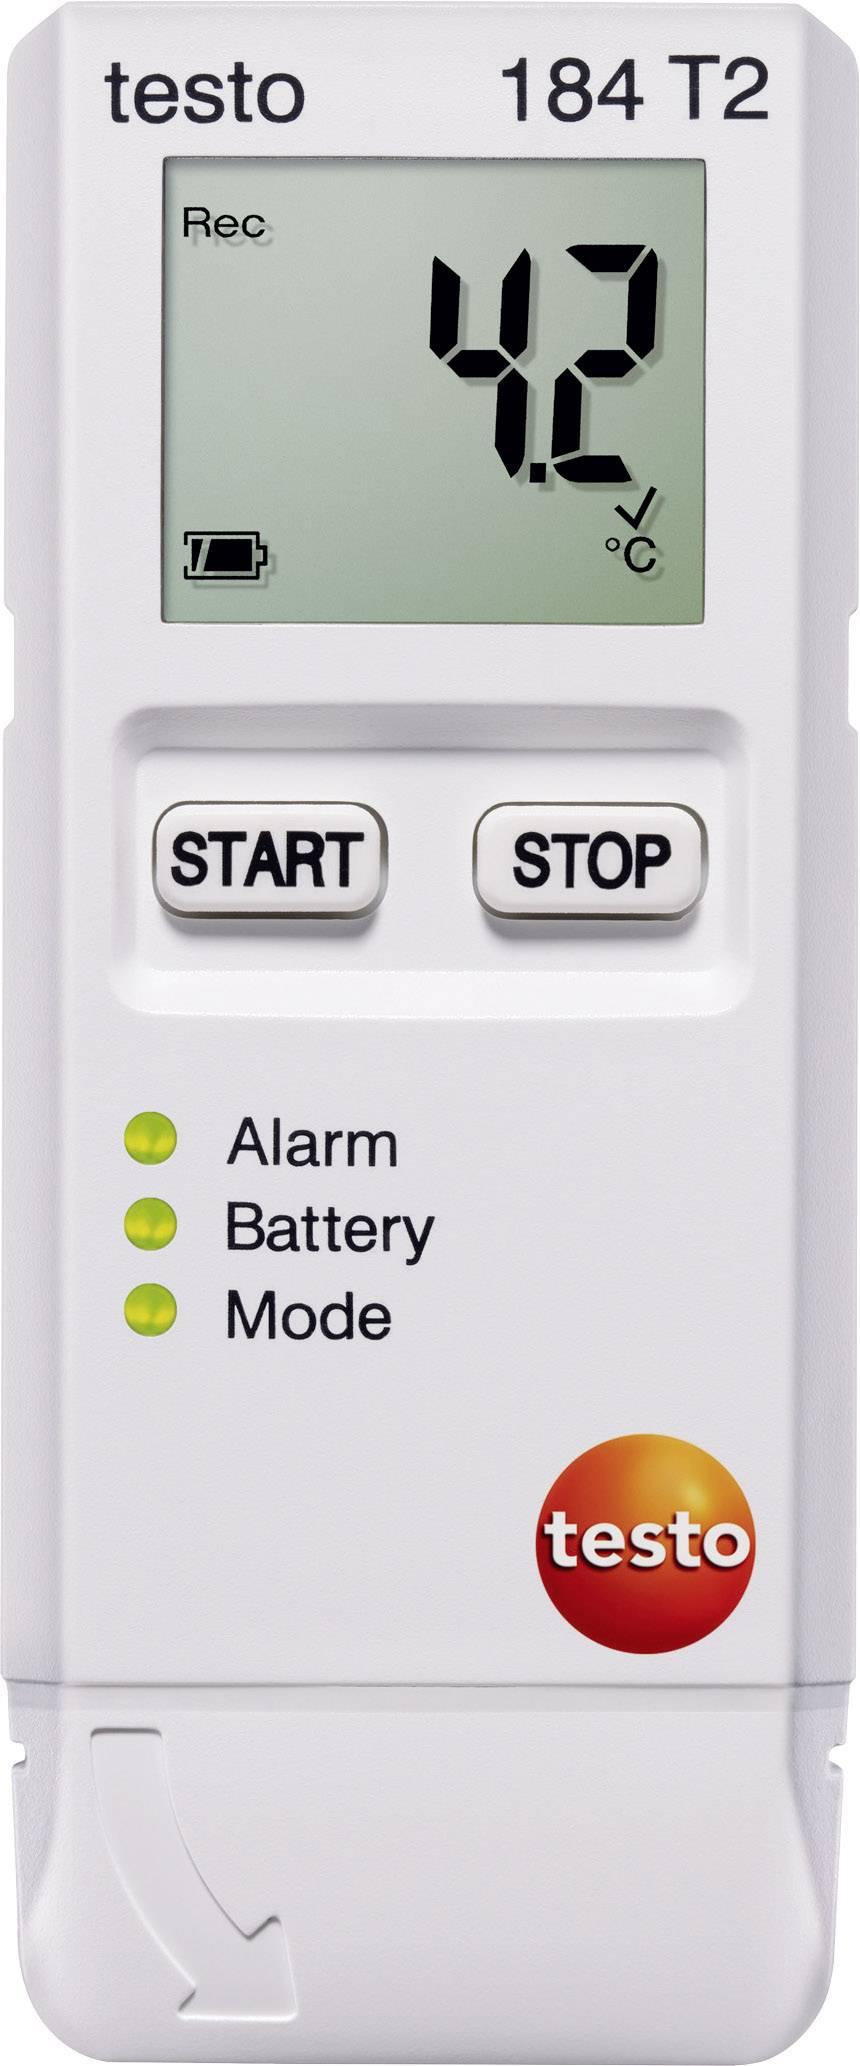 Teplotný datalogger testo 184 T2, -35 až +70 °C